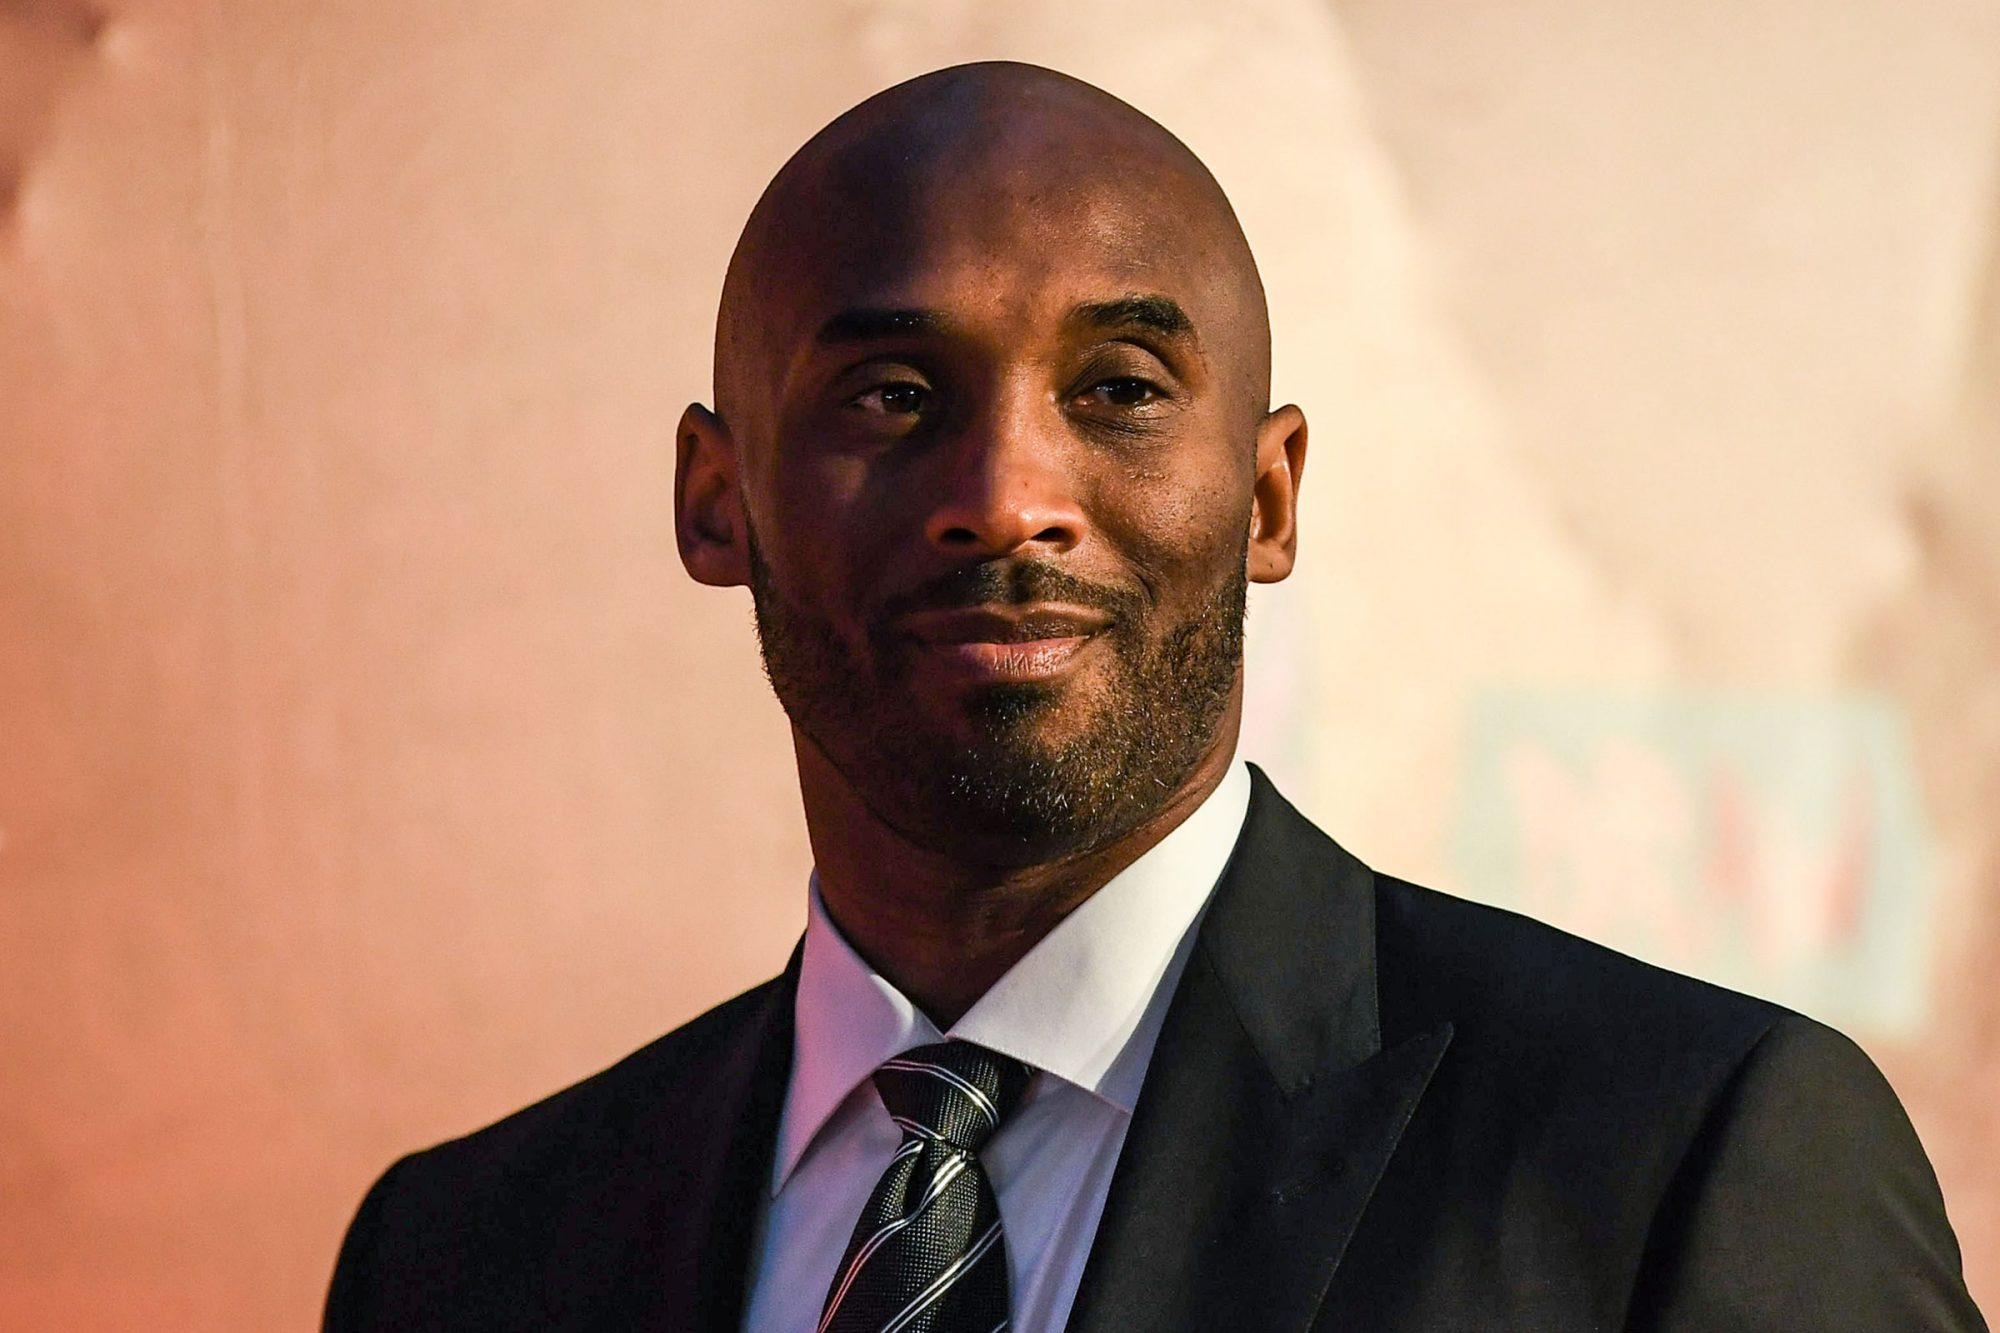 FIBA Basketball World Cup 2019 Draw Ceremony